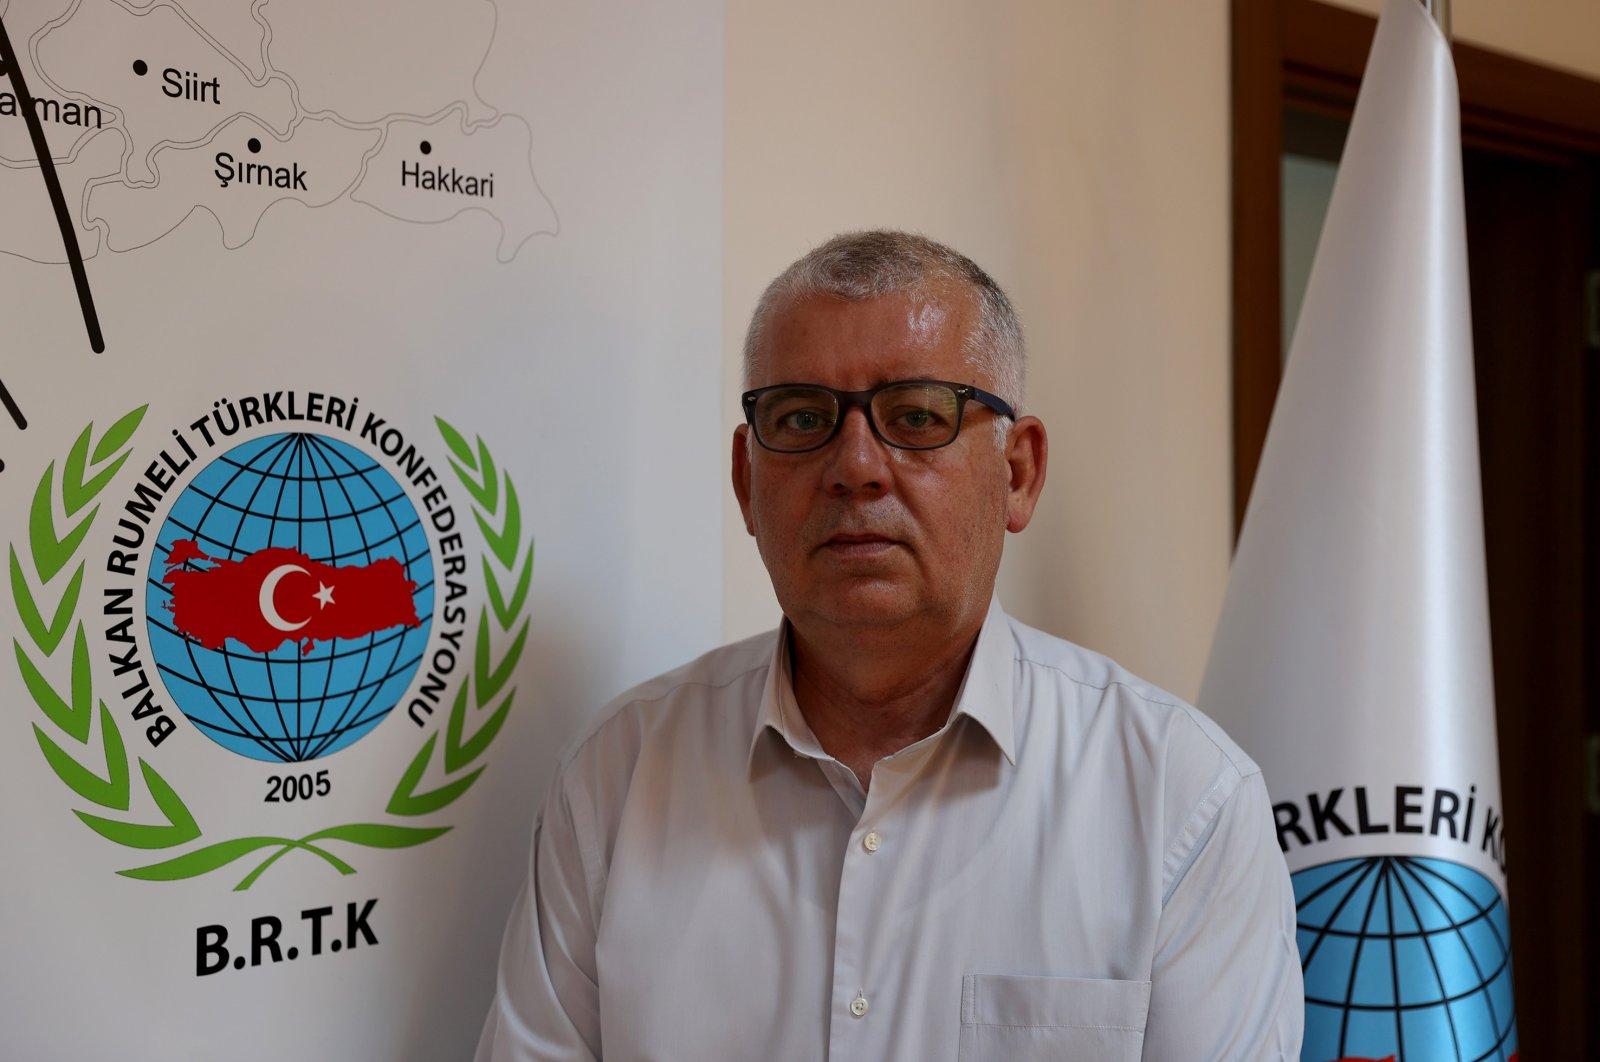 The Balkan Rumeli Turks Confederation (BRTK) Zülfettin Hacıoğlu, Aug. 3, 2021. (AA Photo)